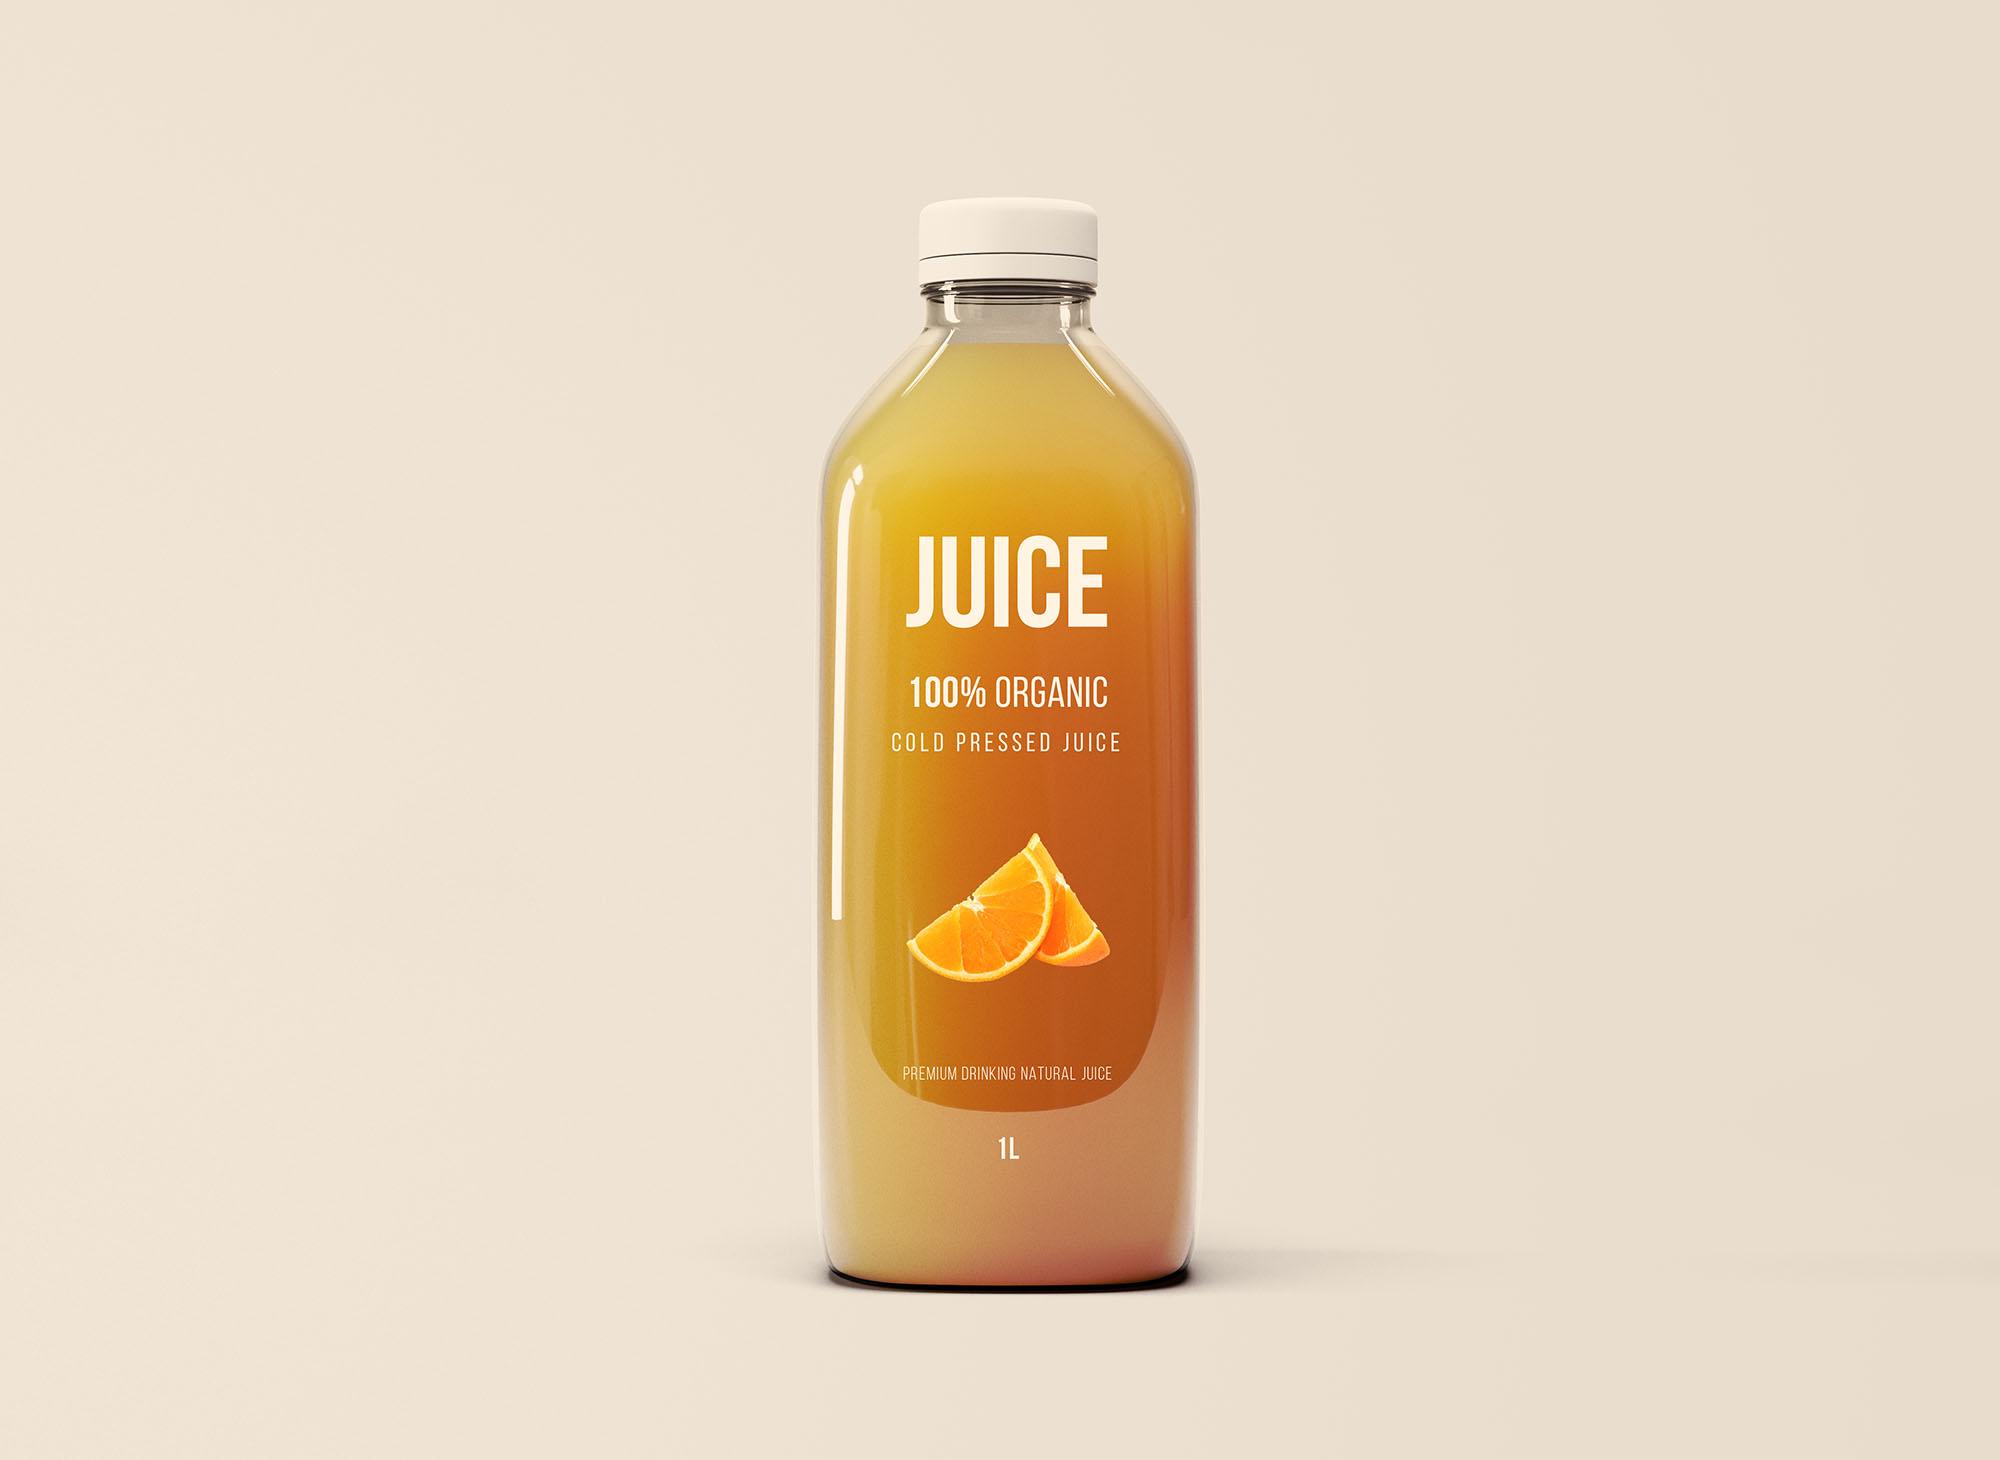 Free Big Glass Juice Bottle Mockup (PSD)